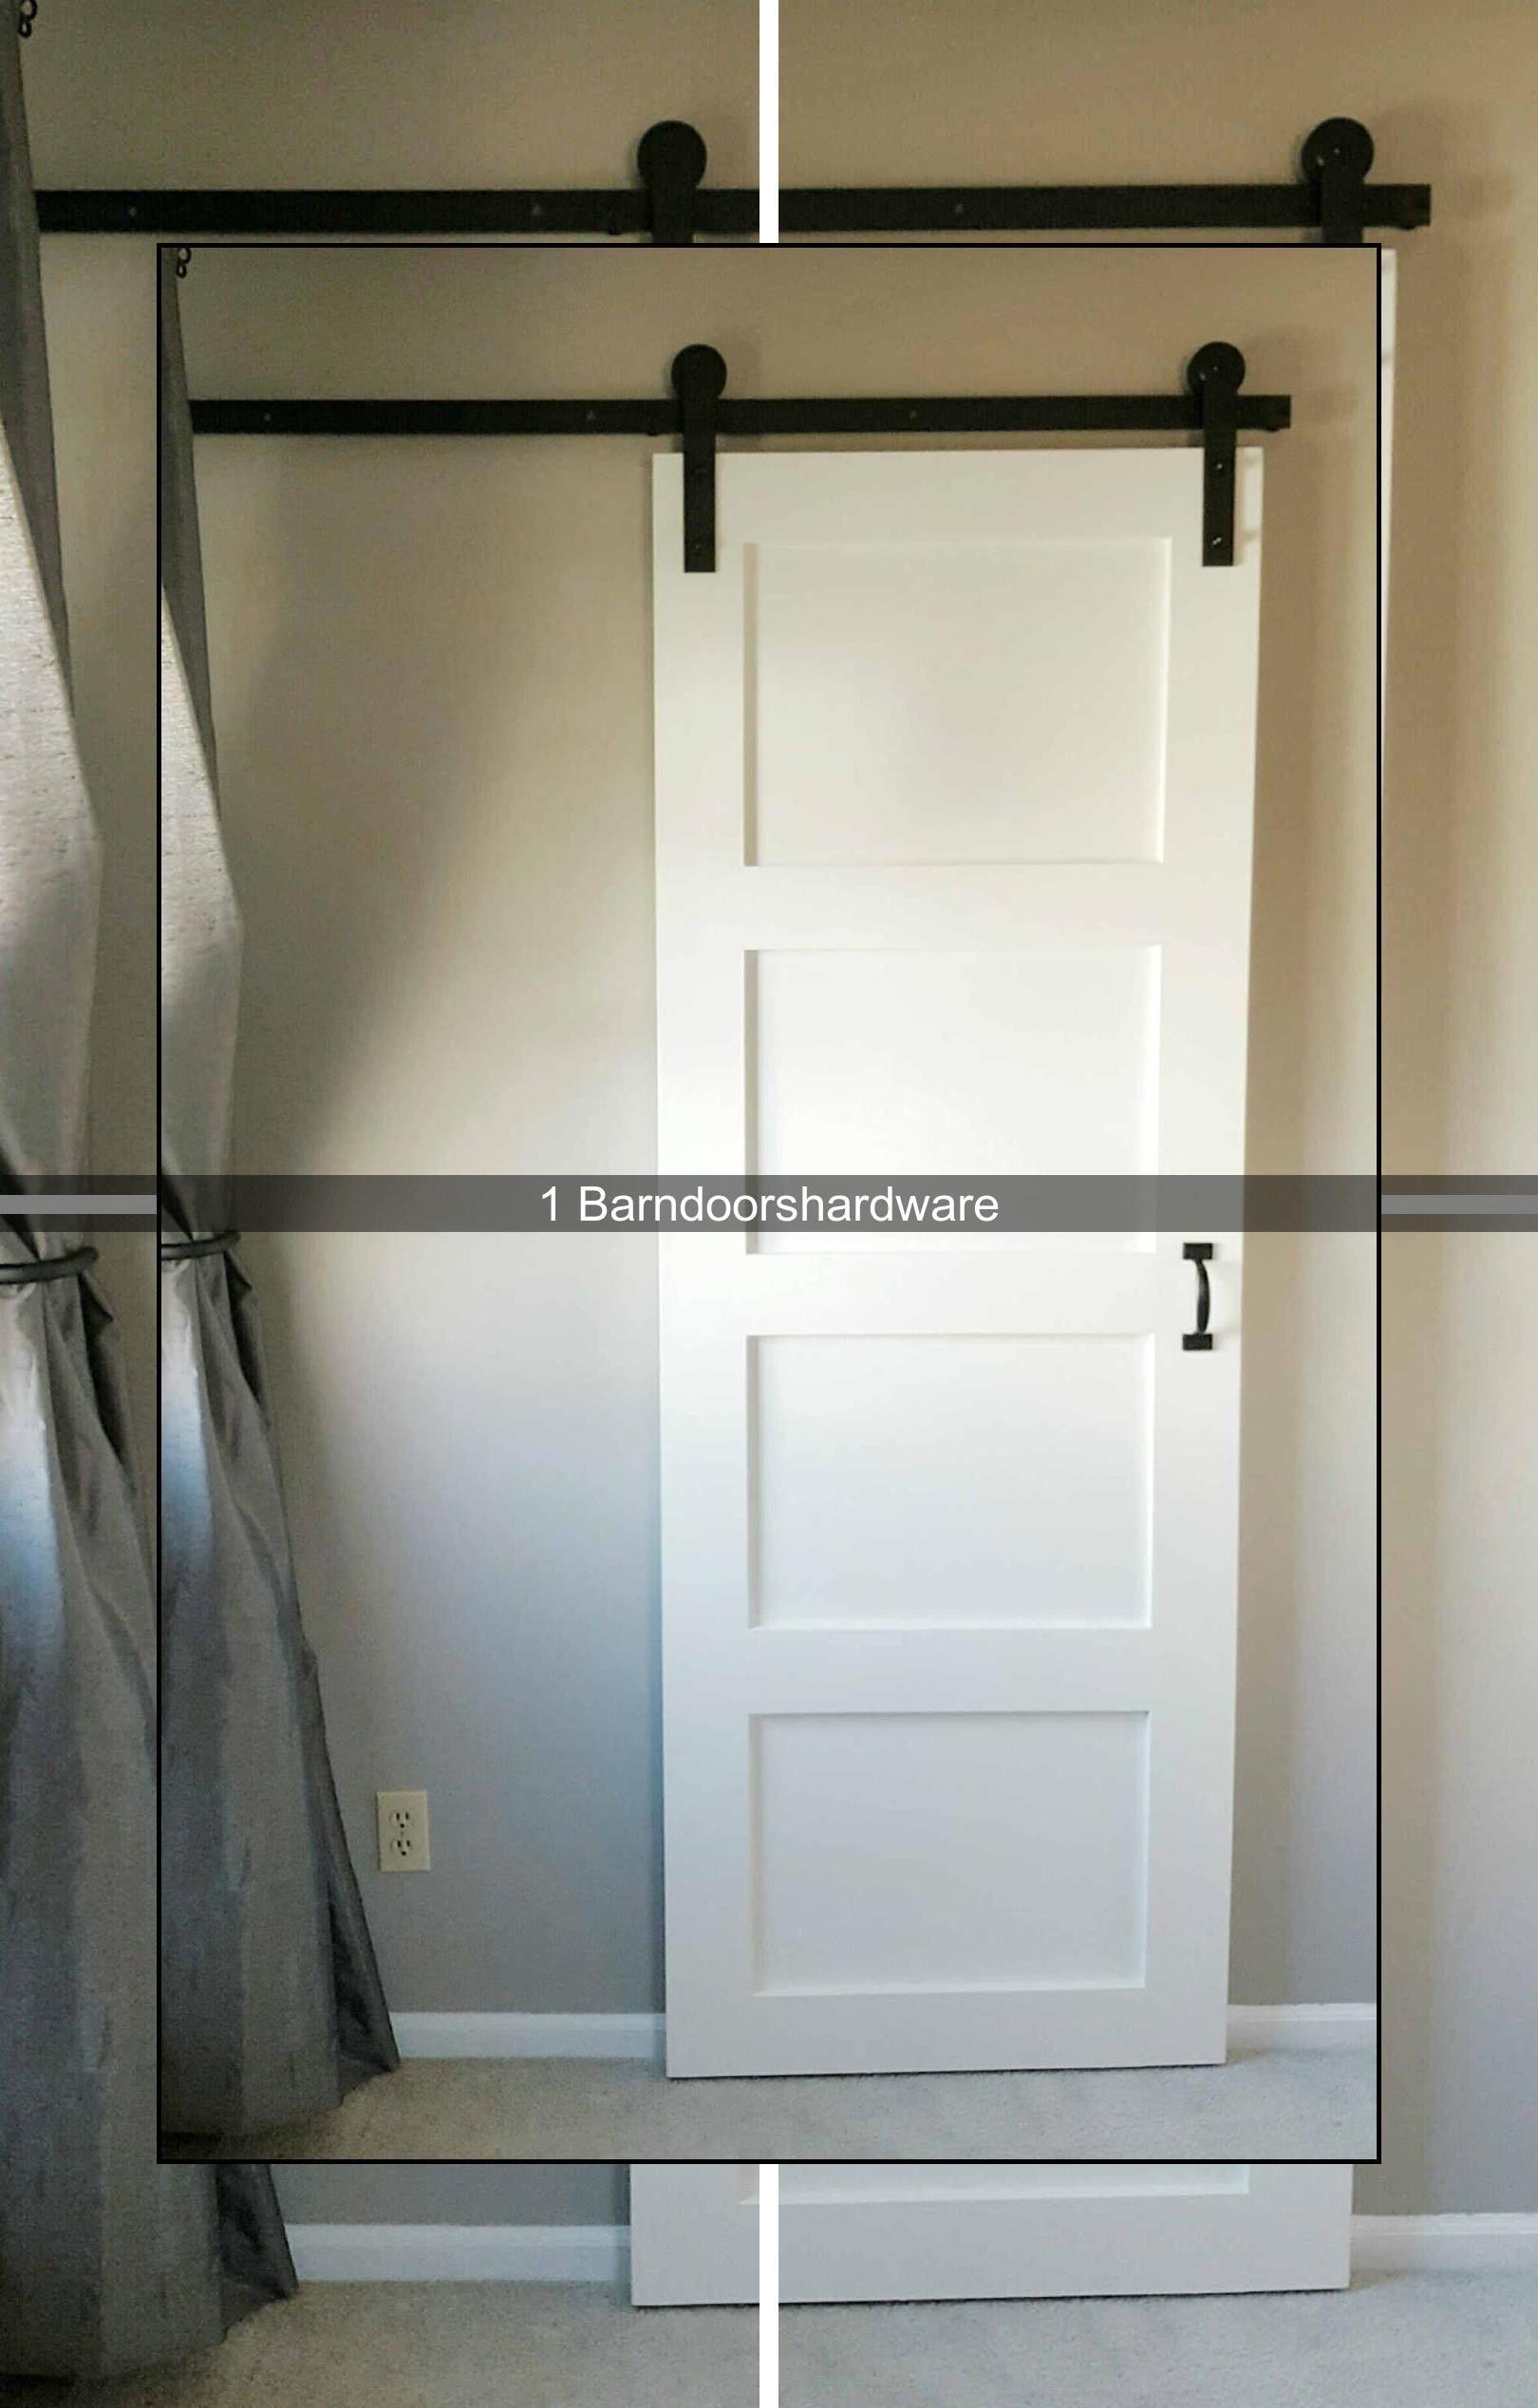 Modern Barn Doors Barn Sliding Door Hardware Heavy Duty Sliding Barn Doors For Inside House In 2020 Indoor